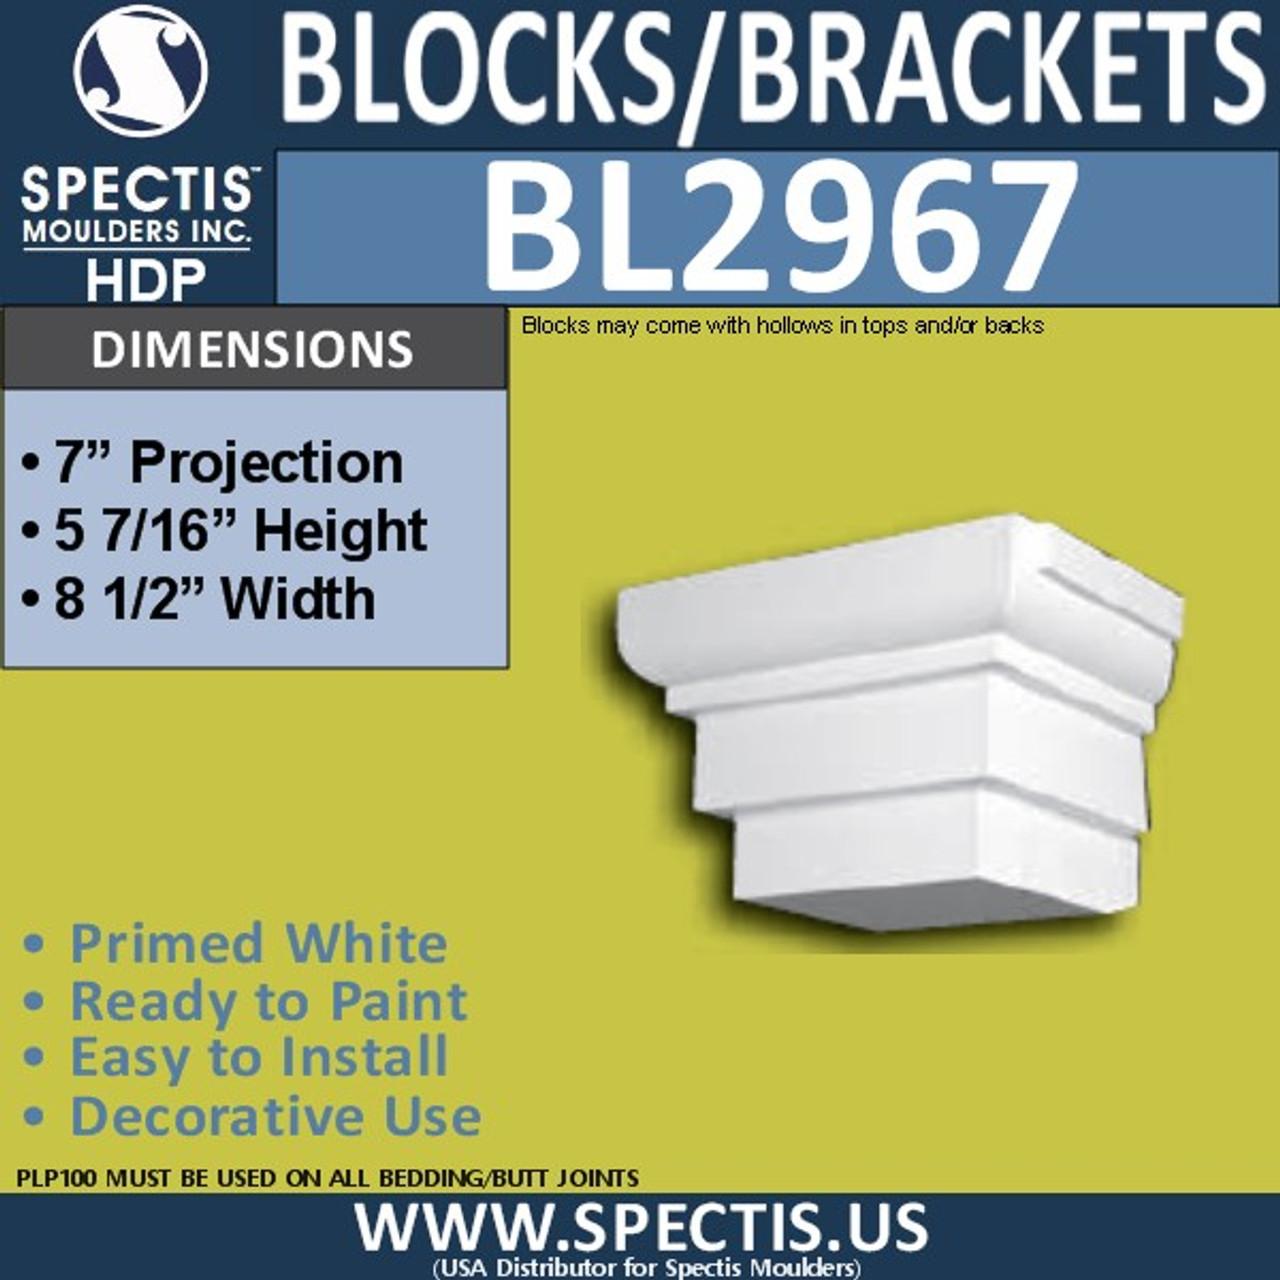 "BL2967 Eave Block or Bracket 8.5""W x 5.5""H x 7"" P"